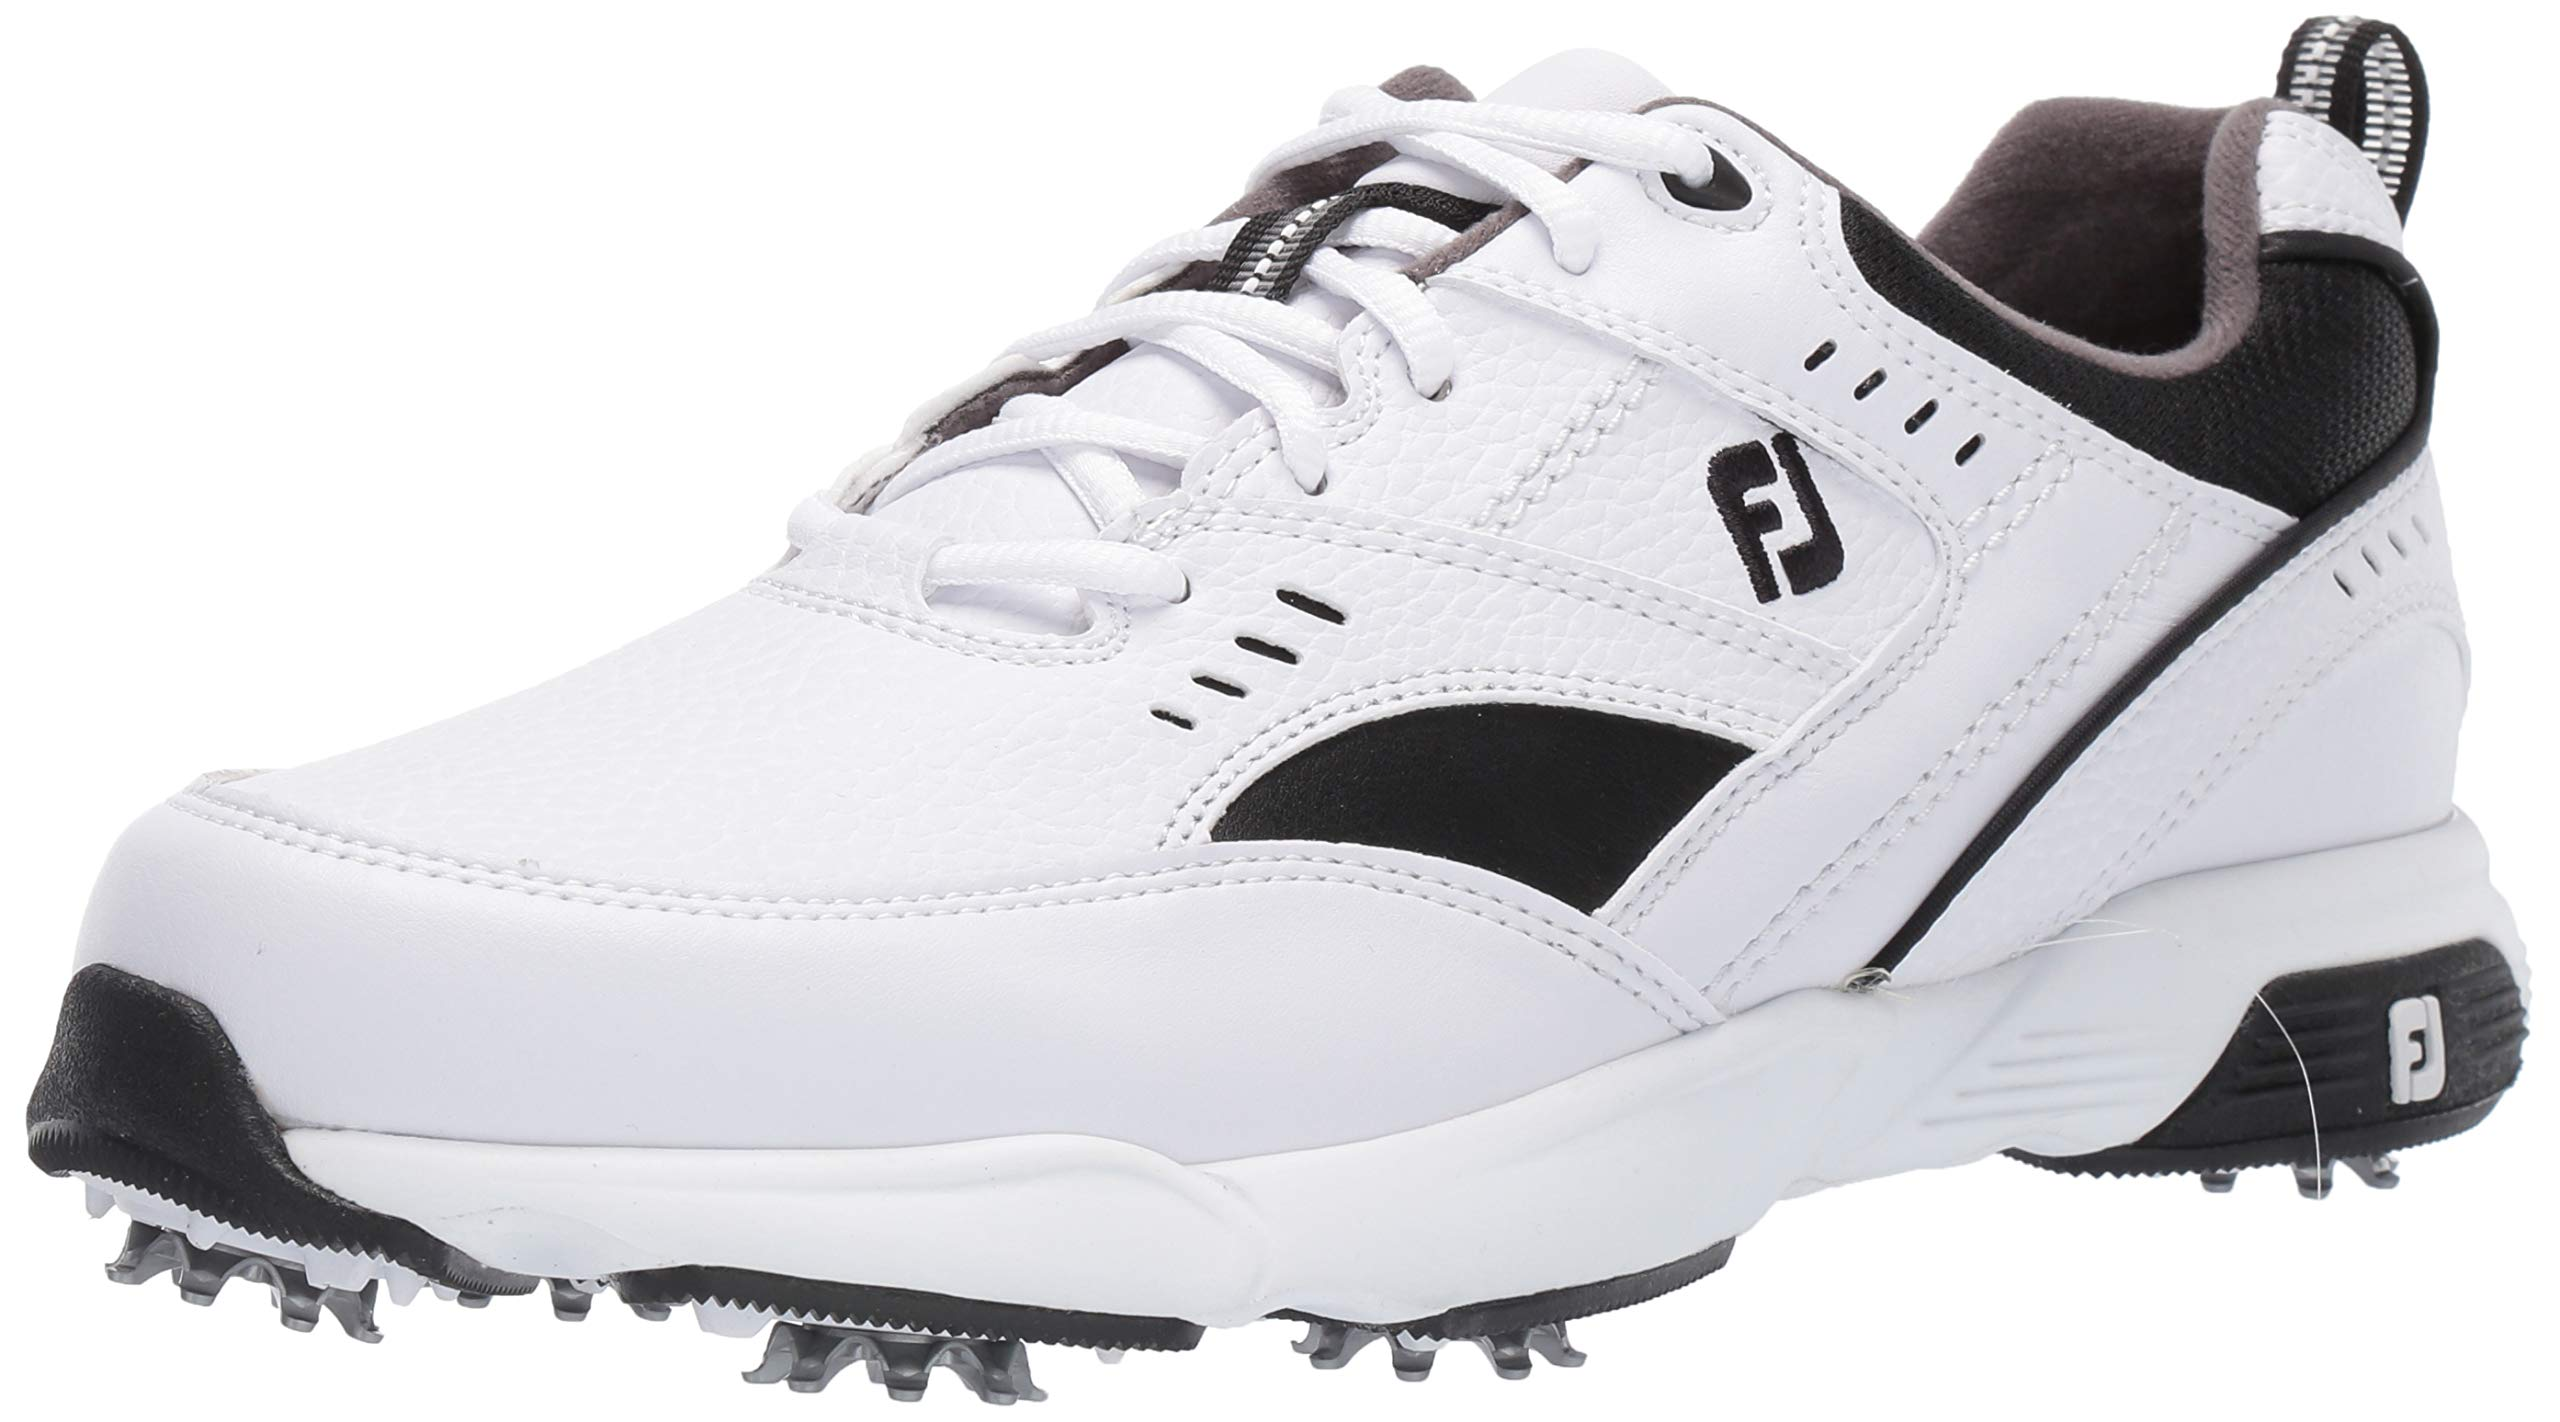 FootJoy Men's Sneaker Golf Shoes, White, 12 W US by FootJoy